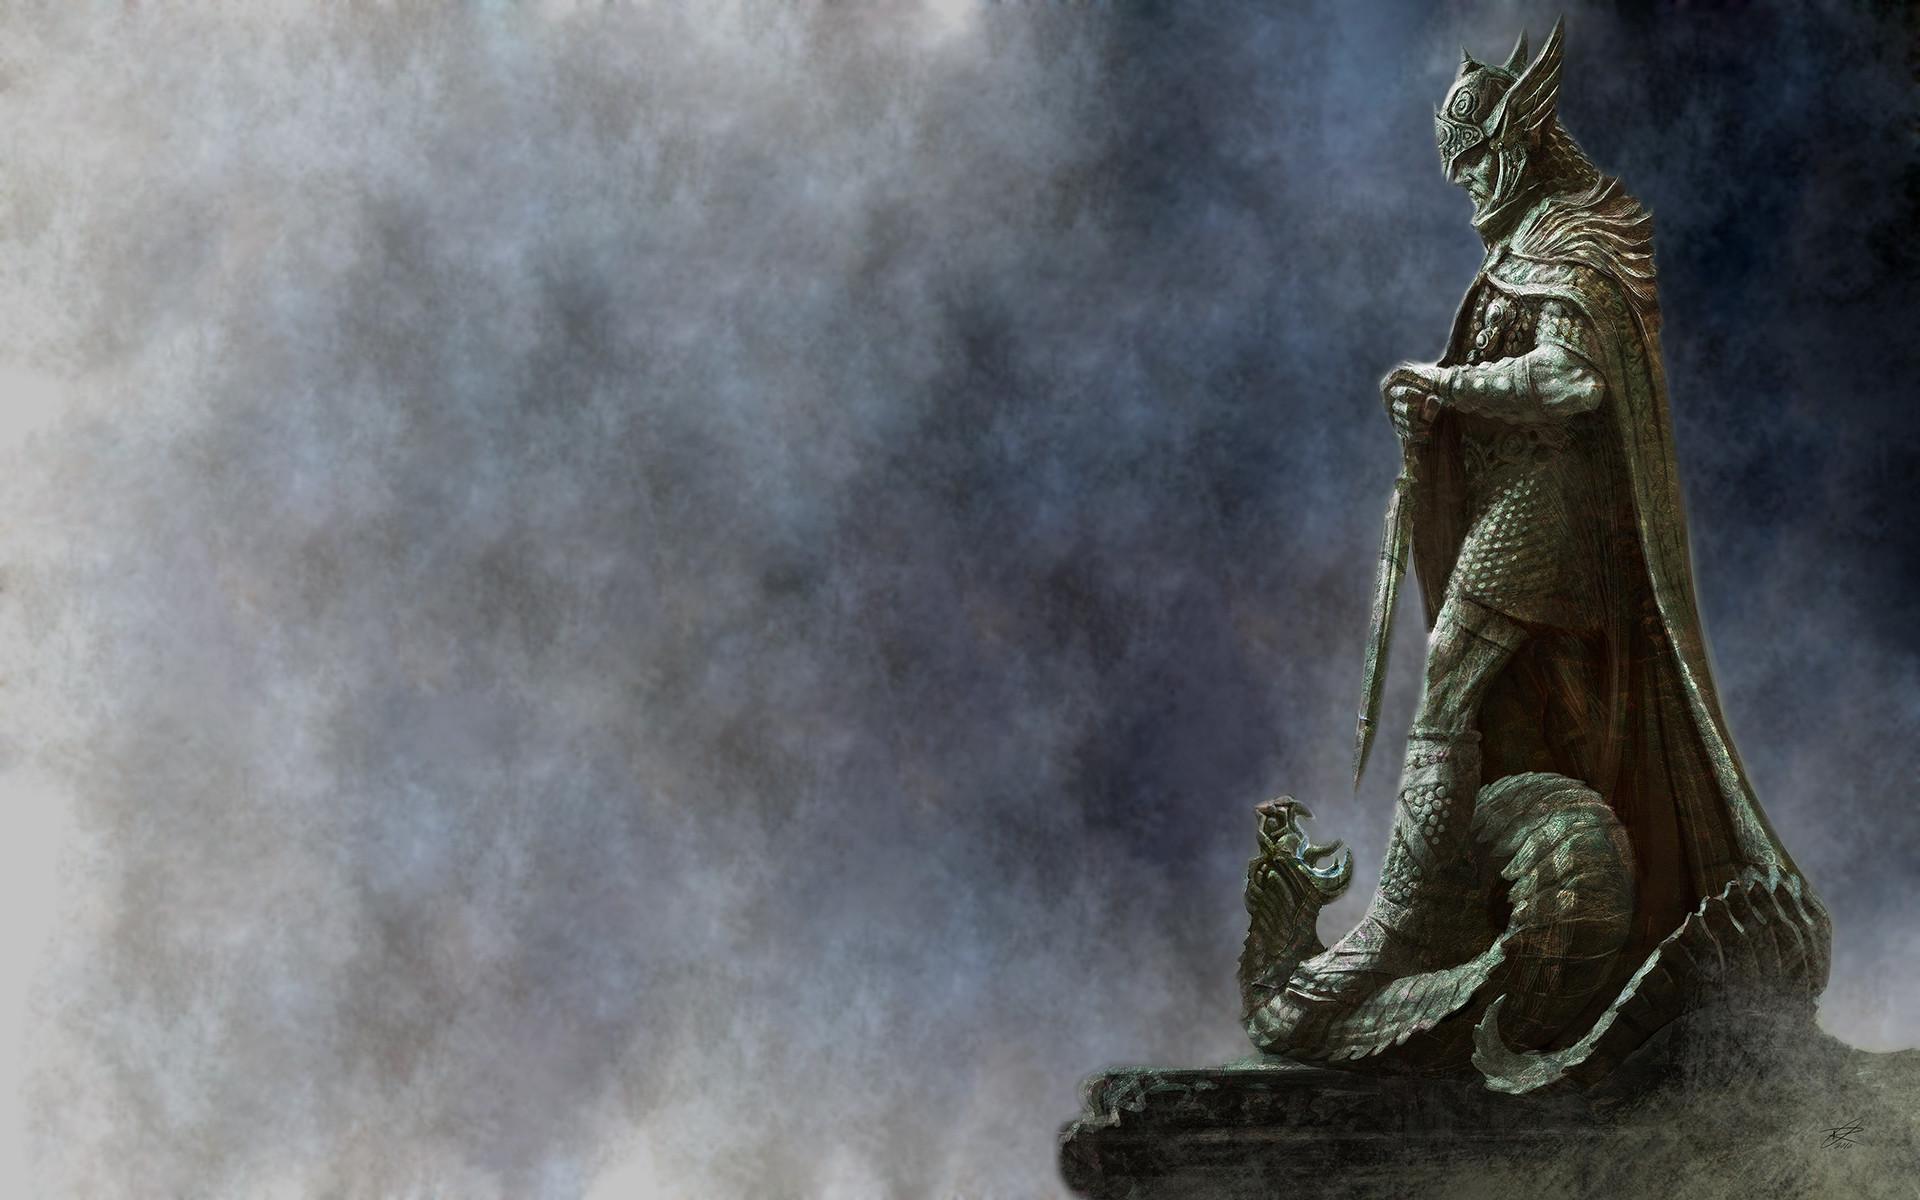 Skyrim Wallpapers Wallpaper Paper Gallery Elder Images Scrolls   Car .